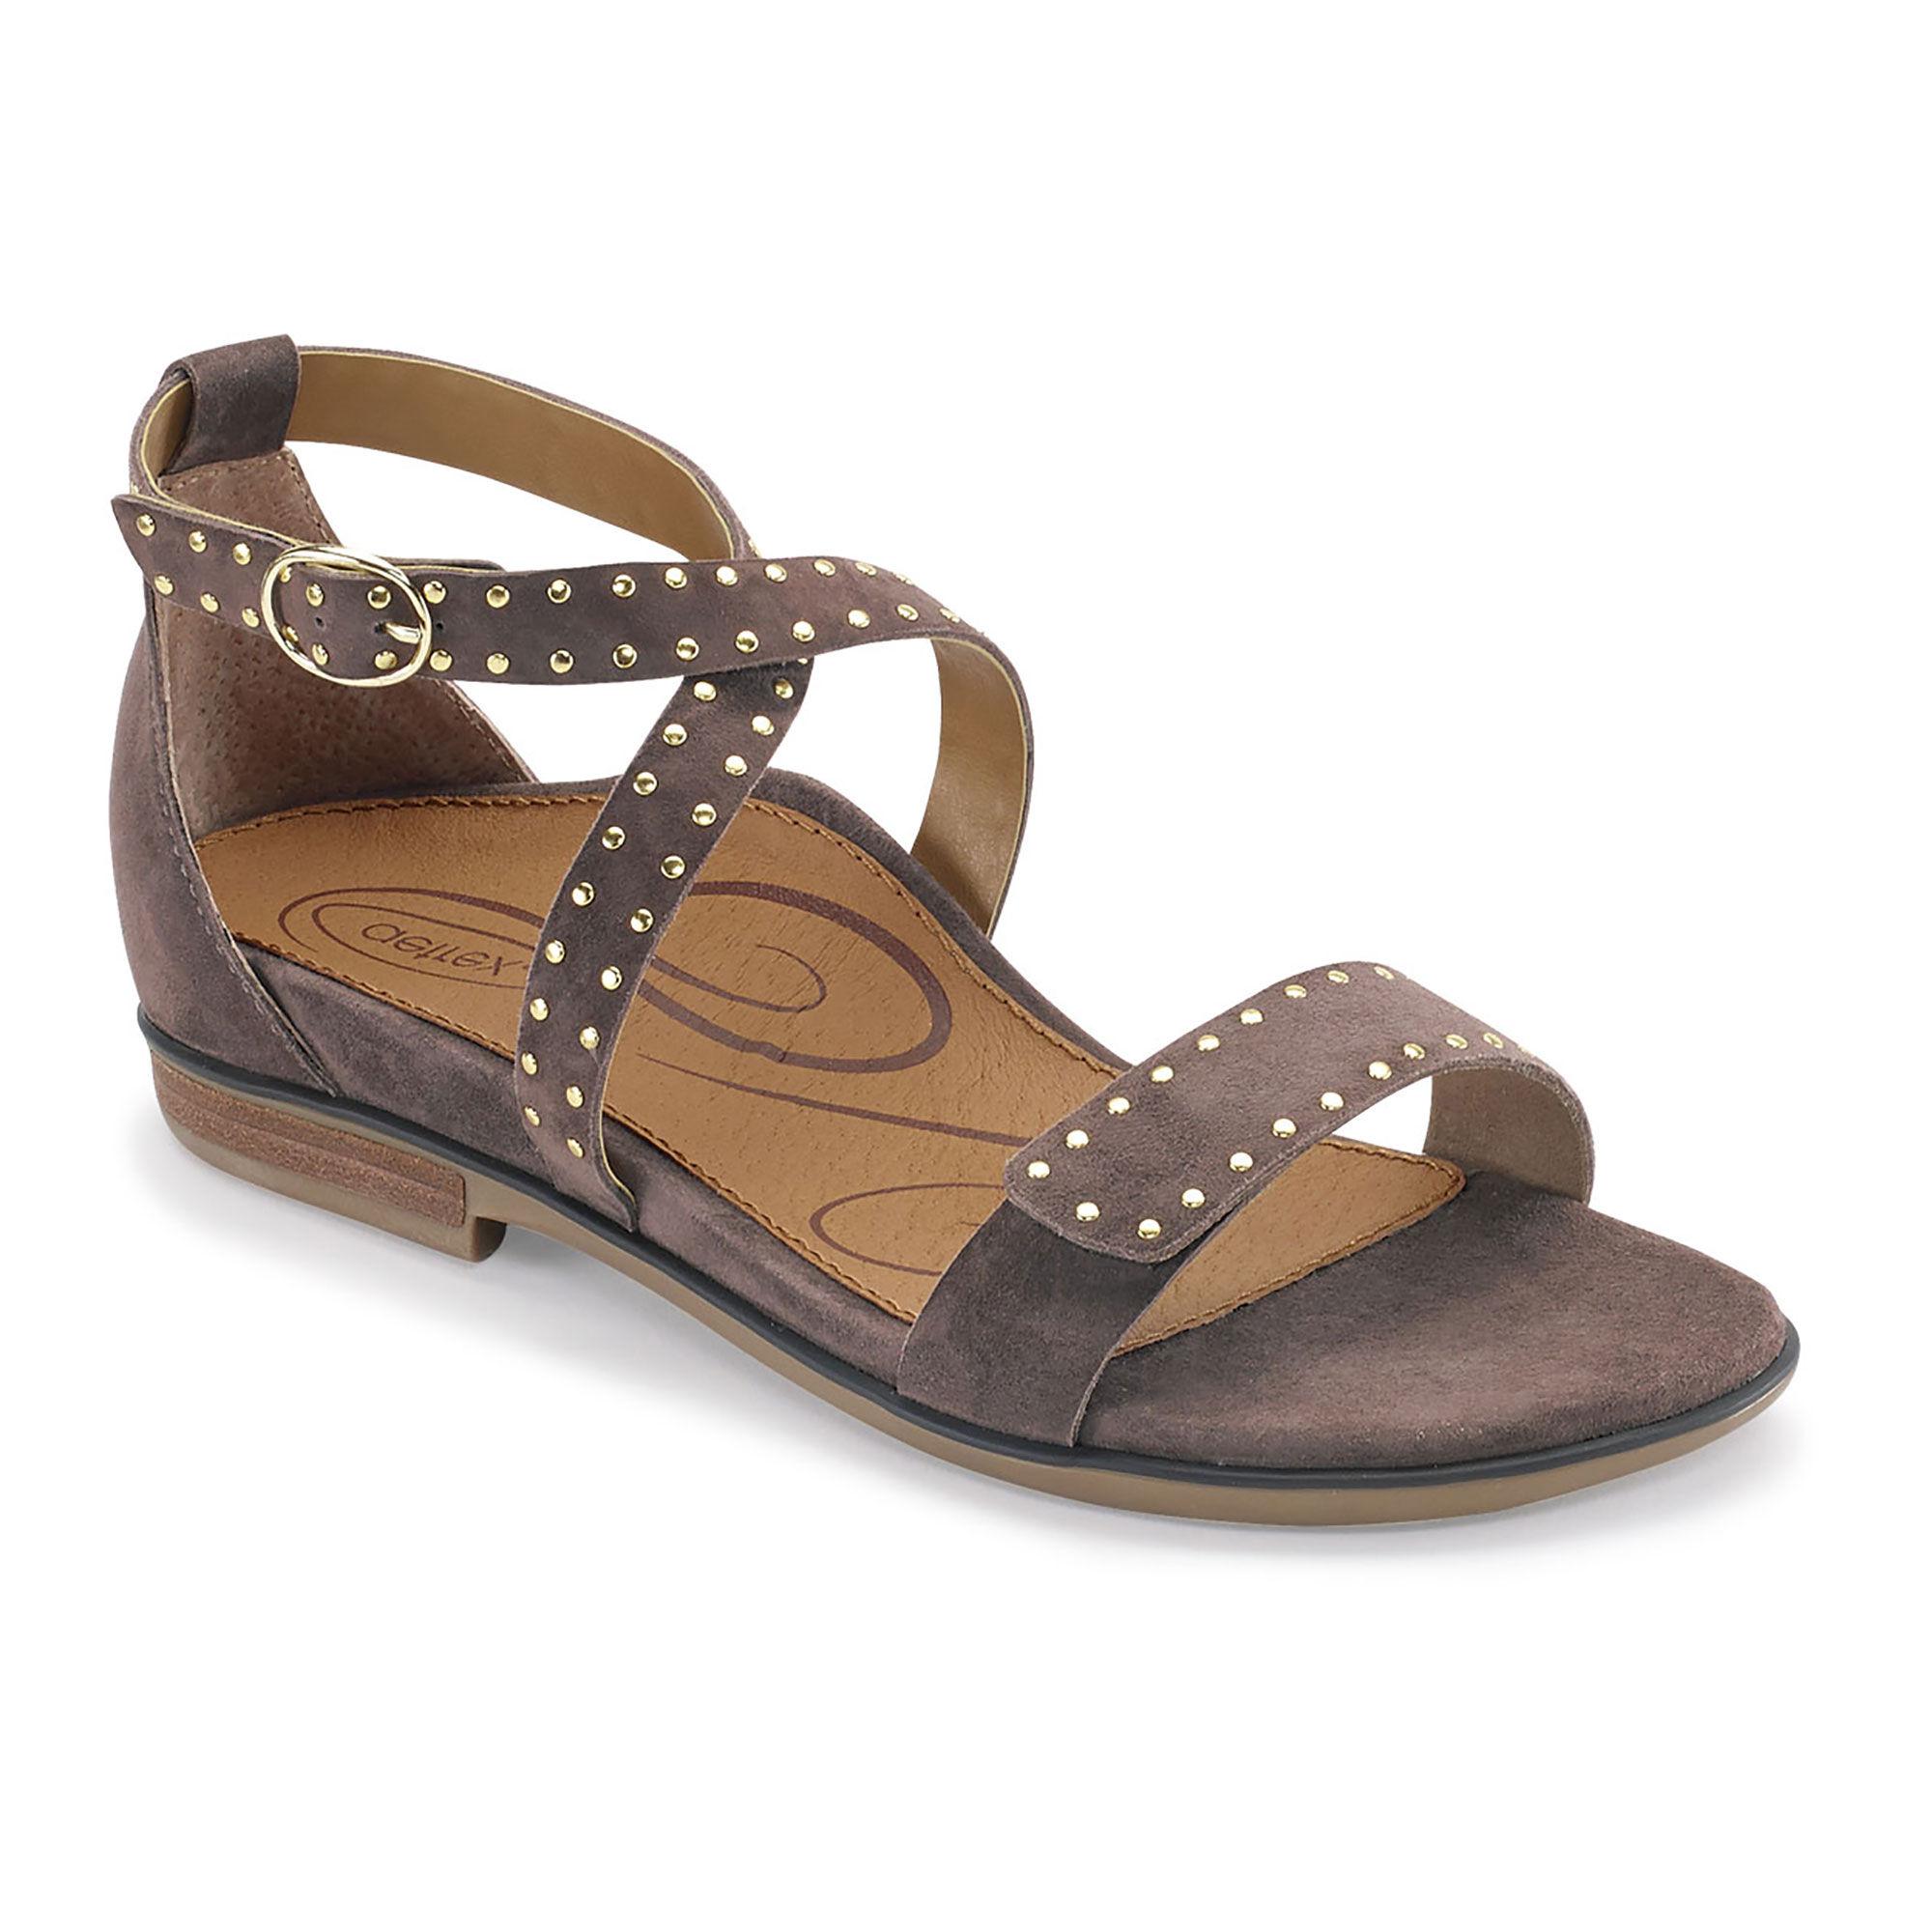 Aetrex Shoes on Sale | Aetrex